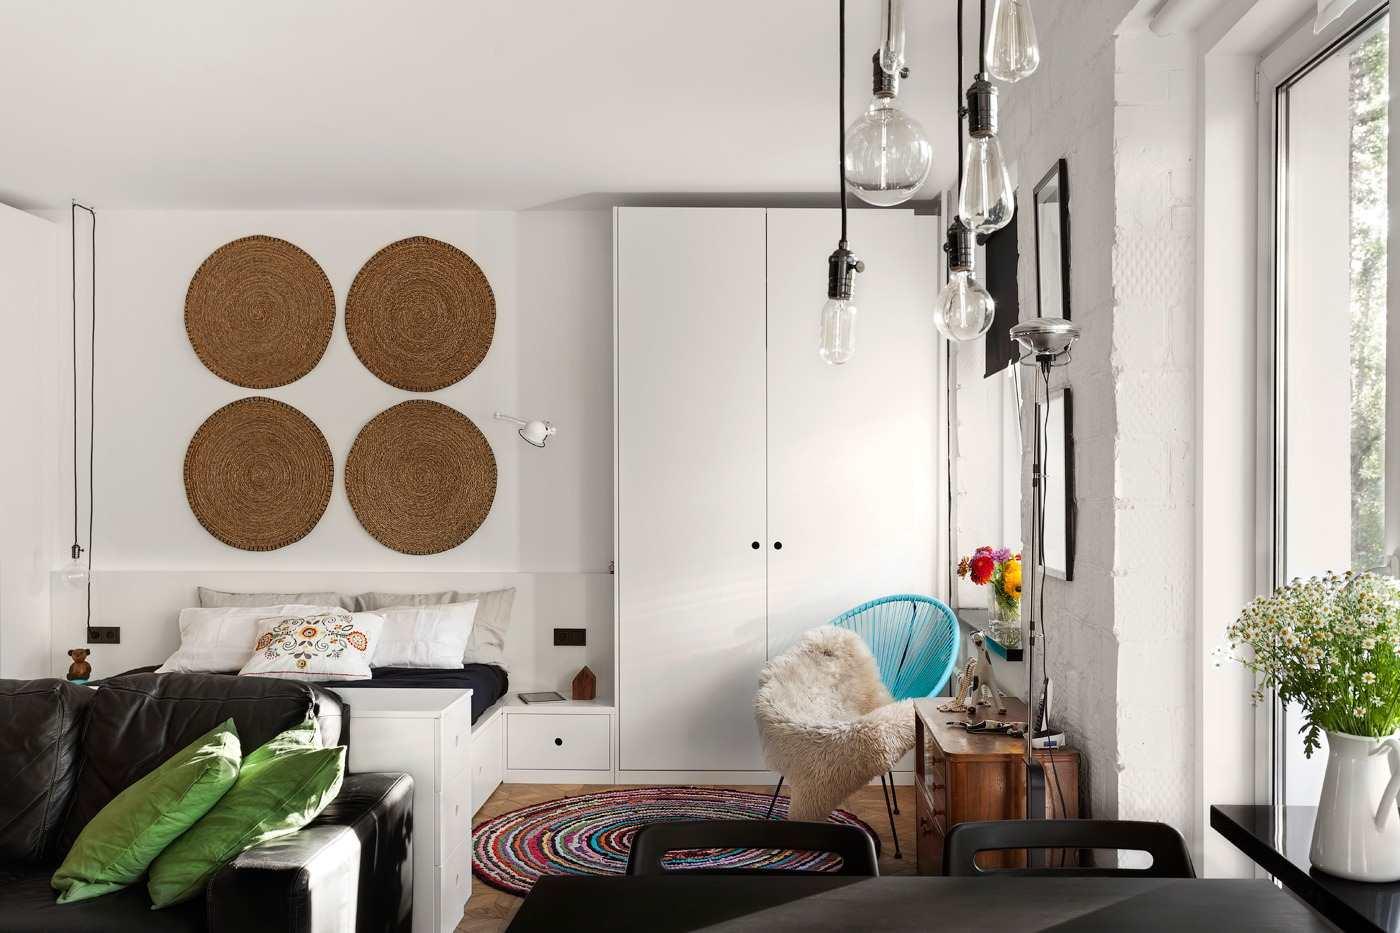 Дизайн однокомнатной квартира 43 кв.м. с фото (3)